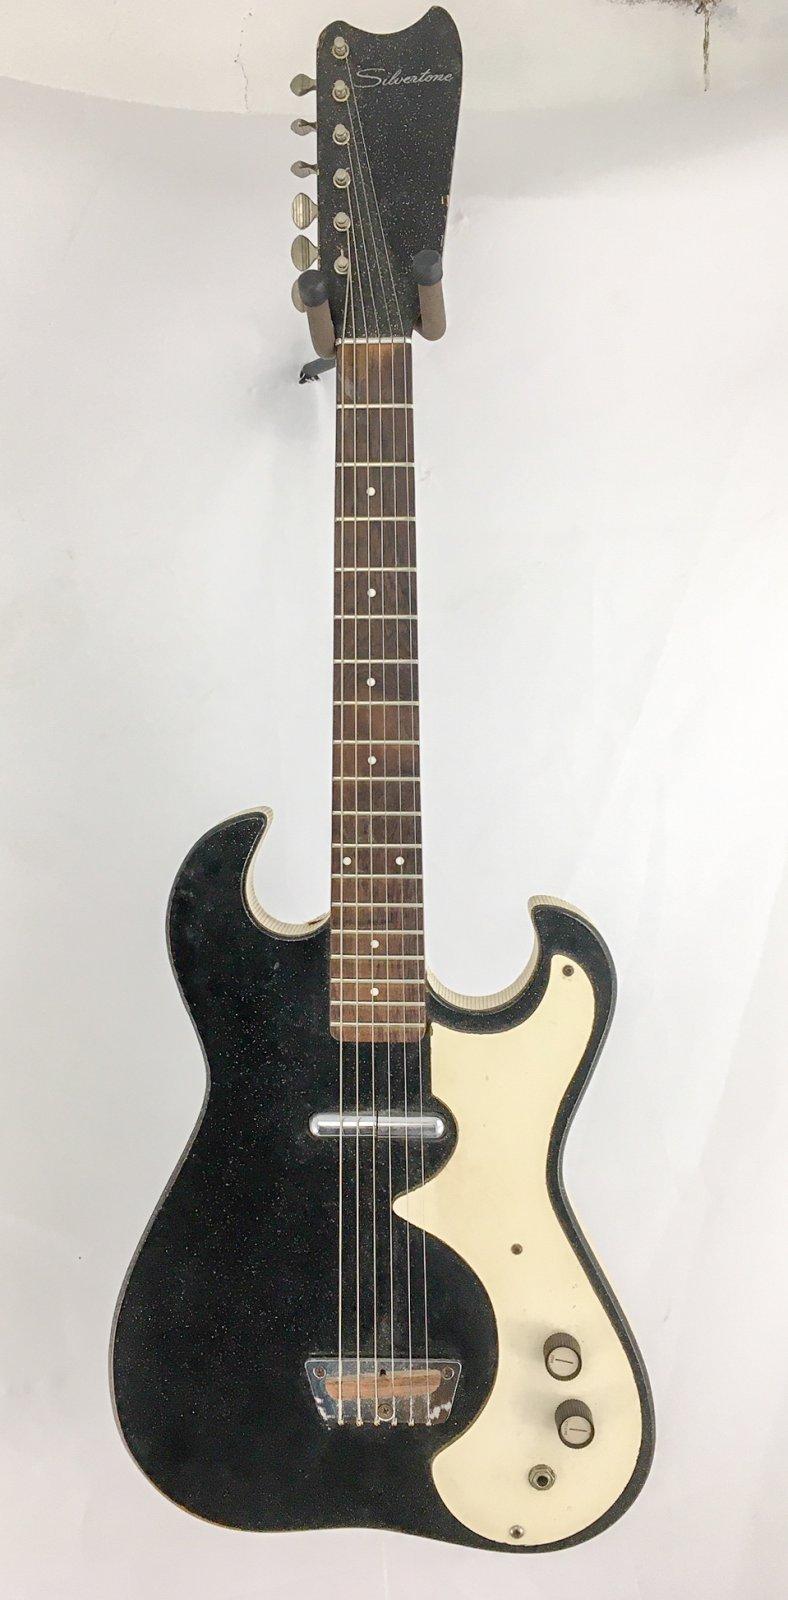 Vintage Silvertone 1448 w/Amp Case